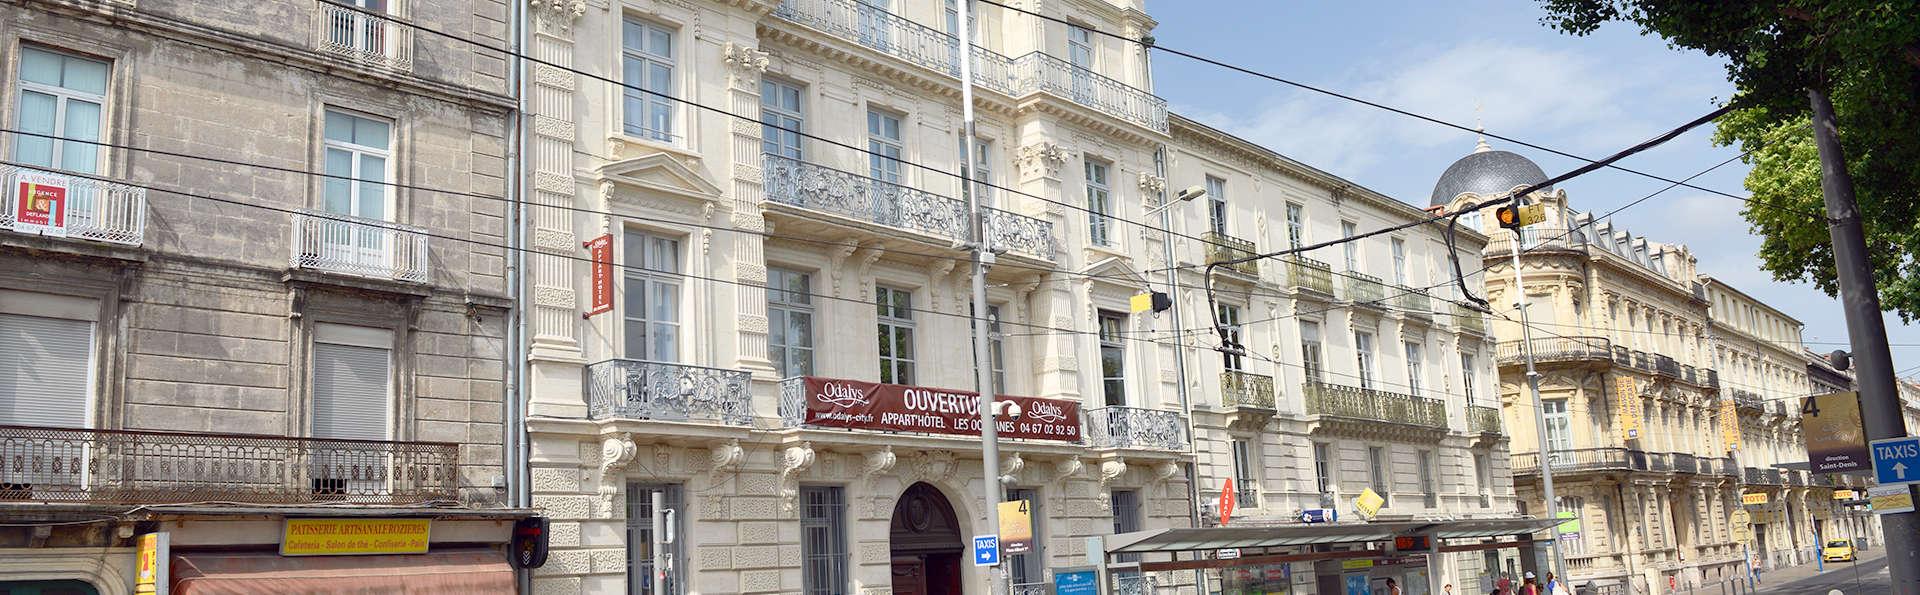 Week-end de luxe en Suite en plein cœur de Montpellier